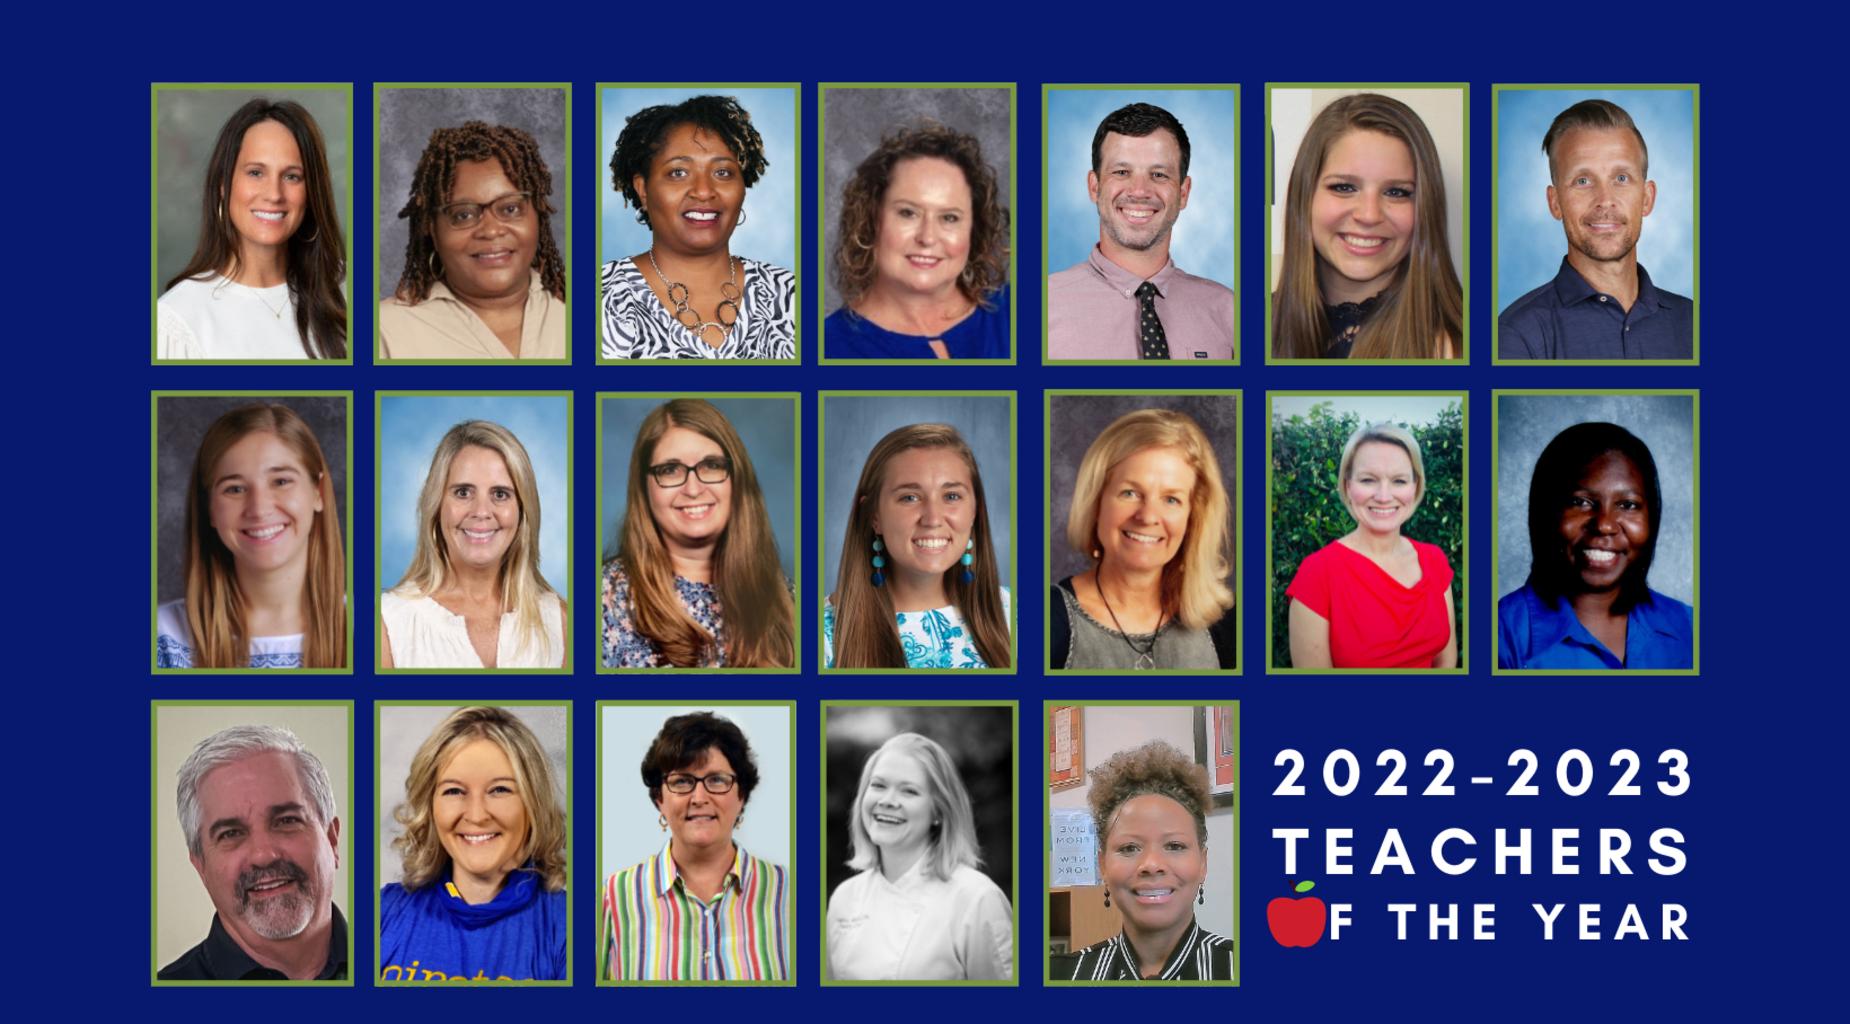 2022-23 Teachers of the Year